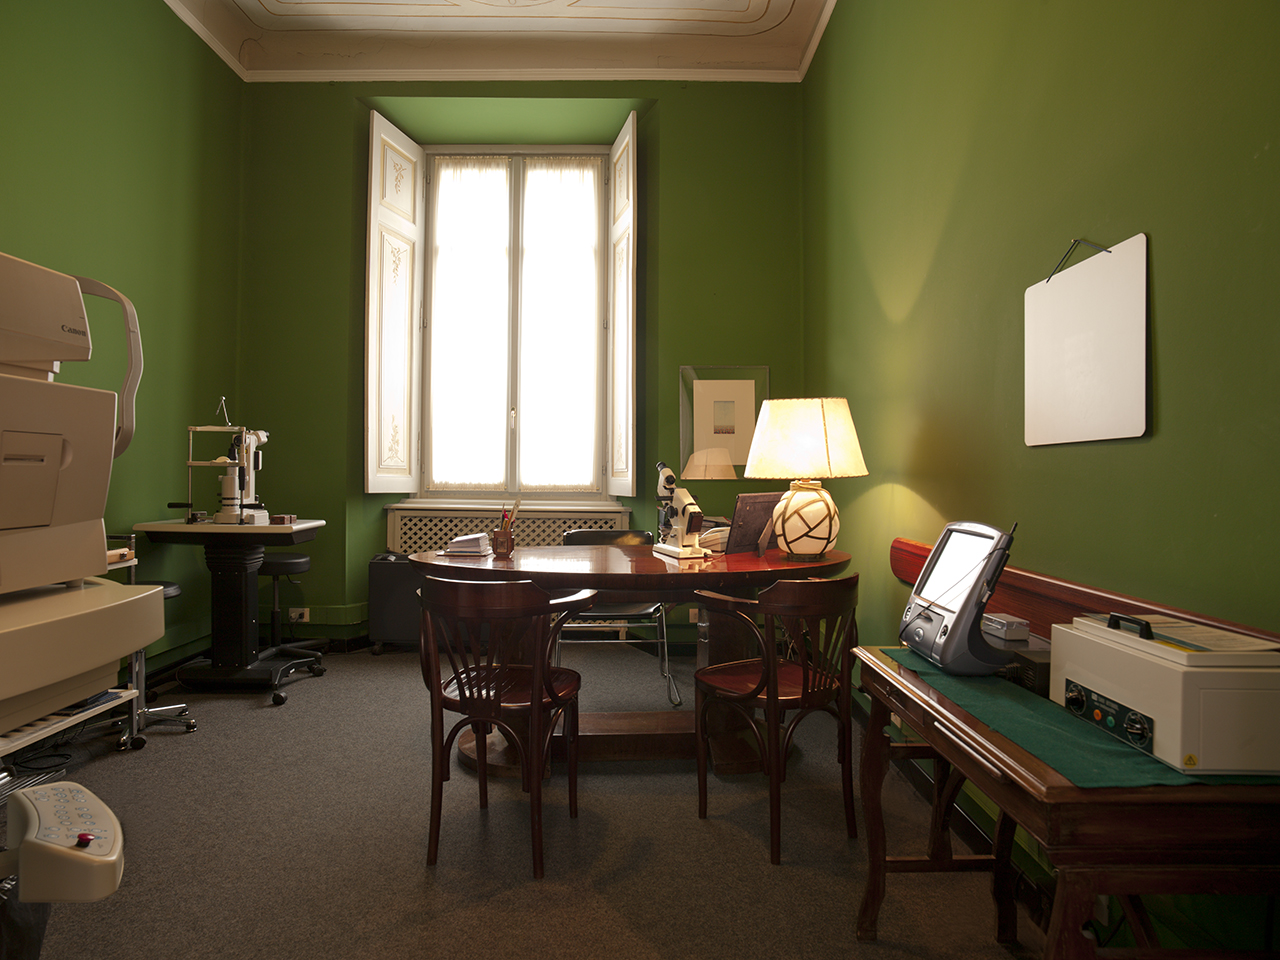 Studio Medico / Como 7